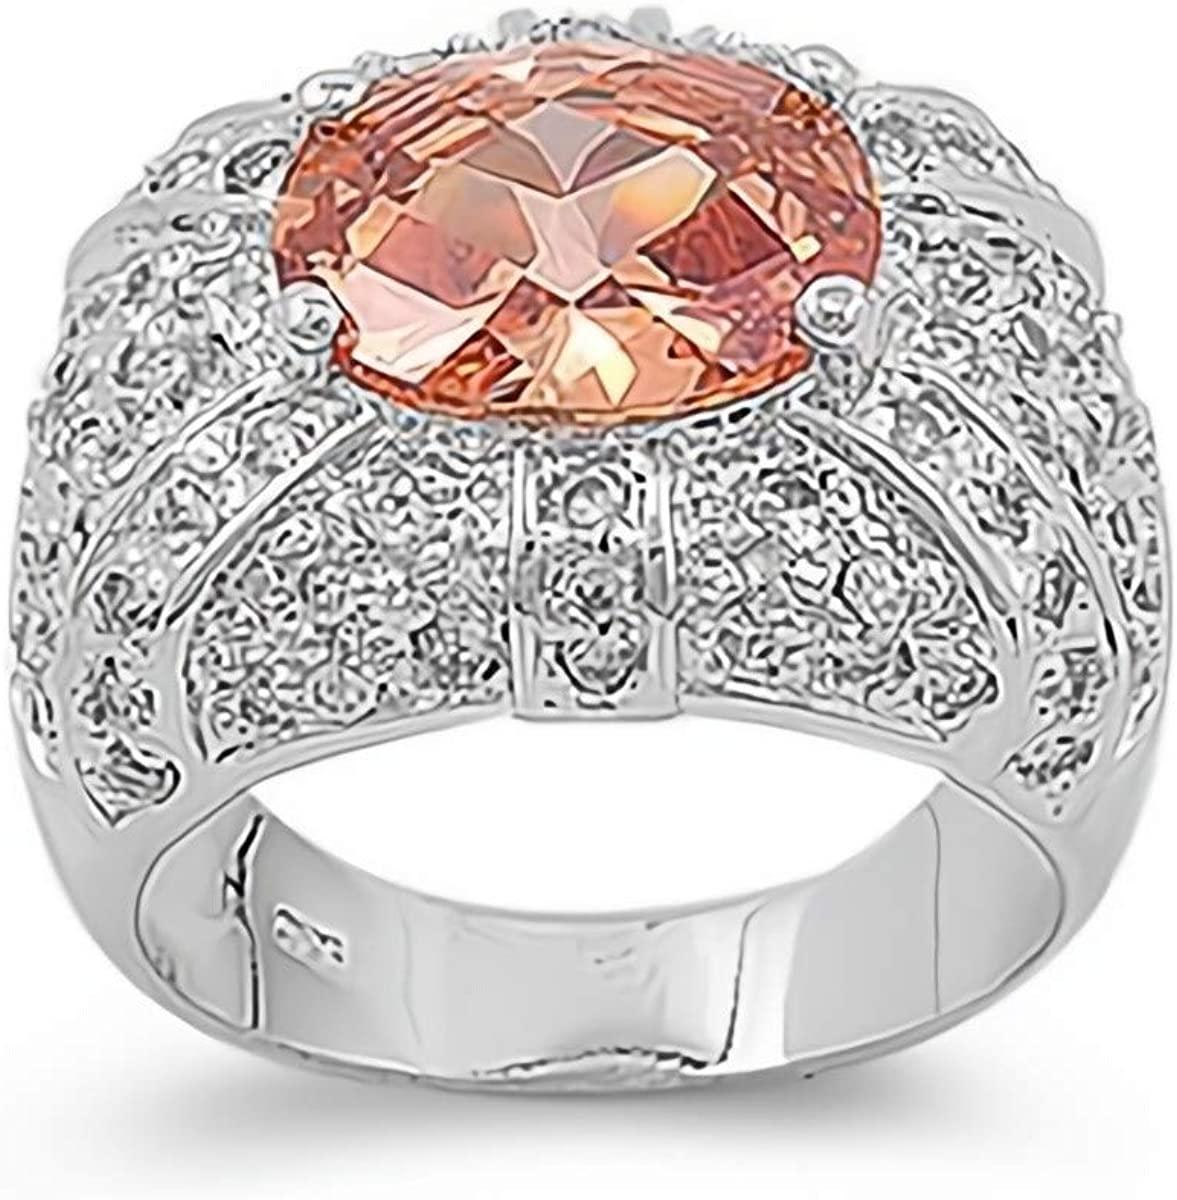 Glitzs Jewels 925 Sterling Silver CZ Ring (Tan/Brown & Clear)   Cubic Zirconia Jewelry Gift